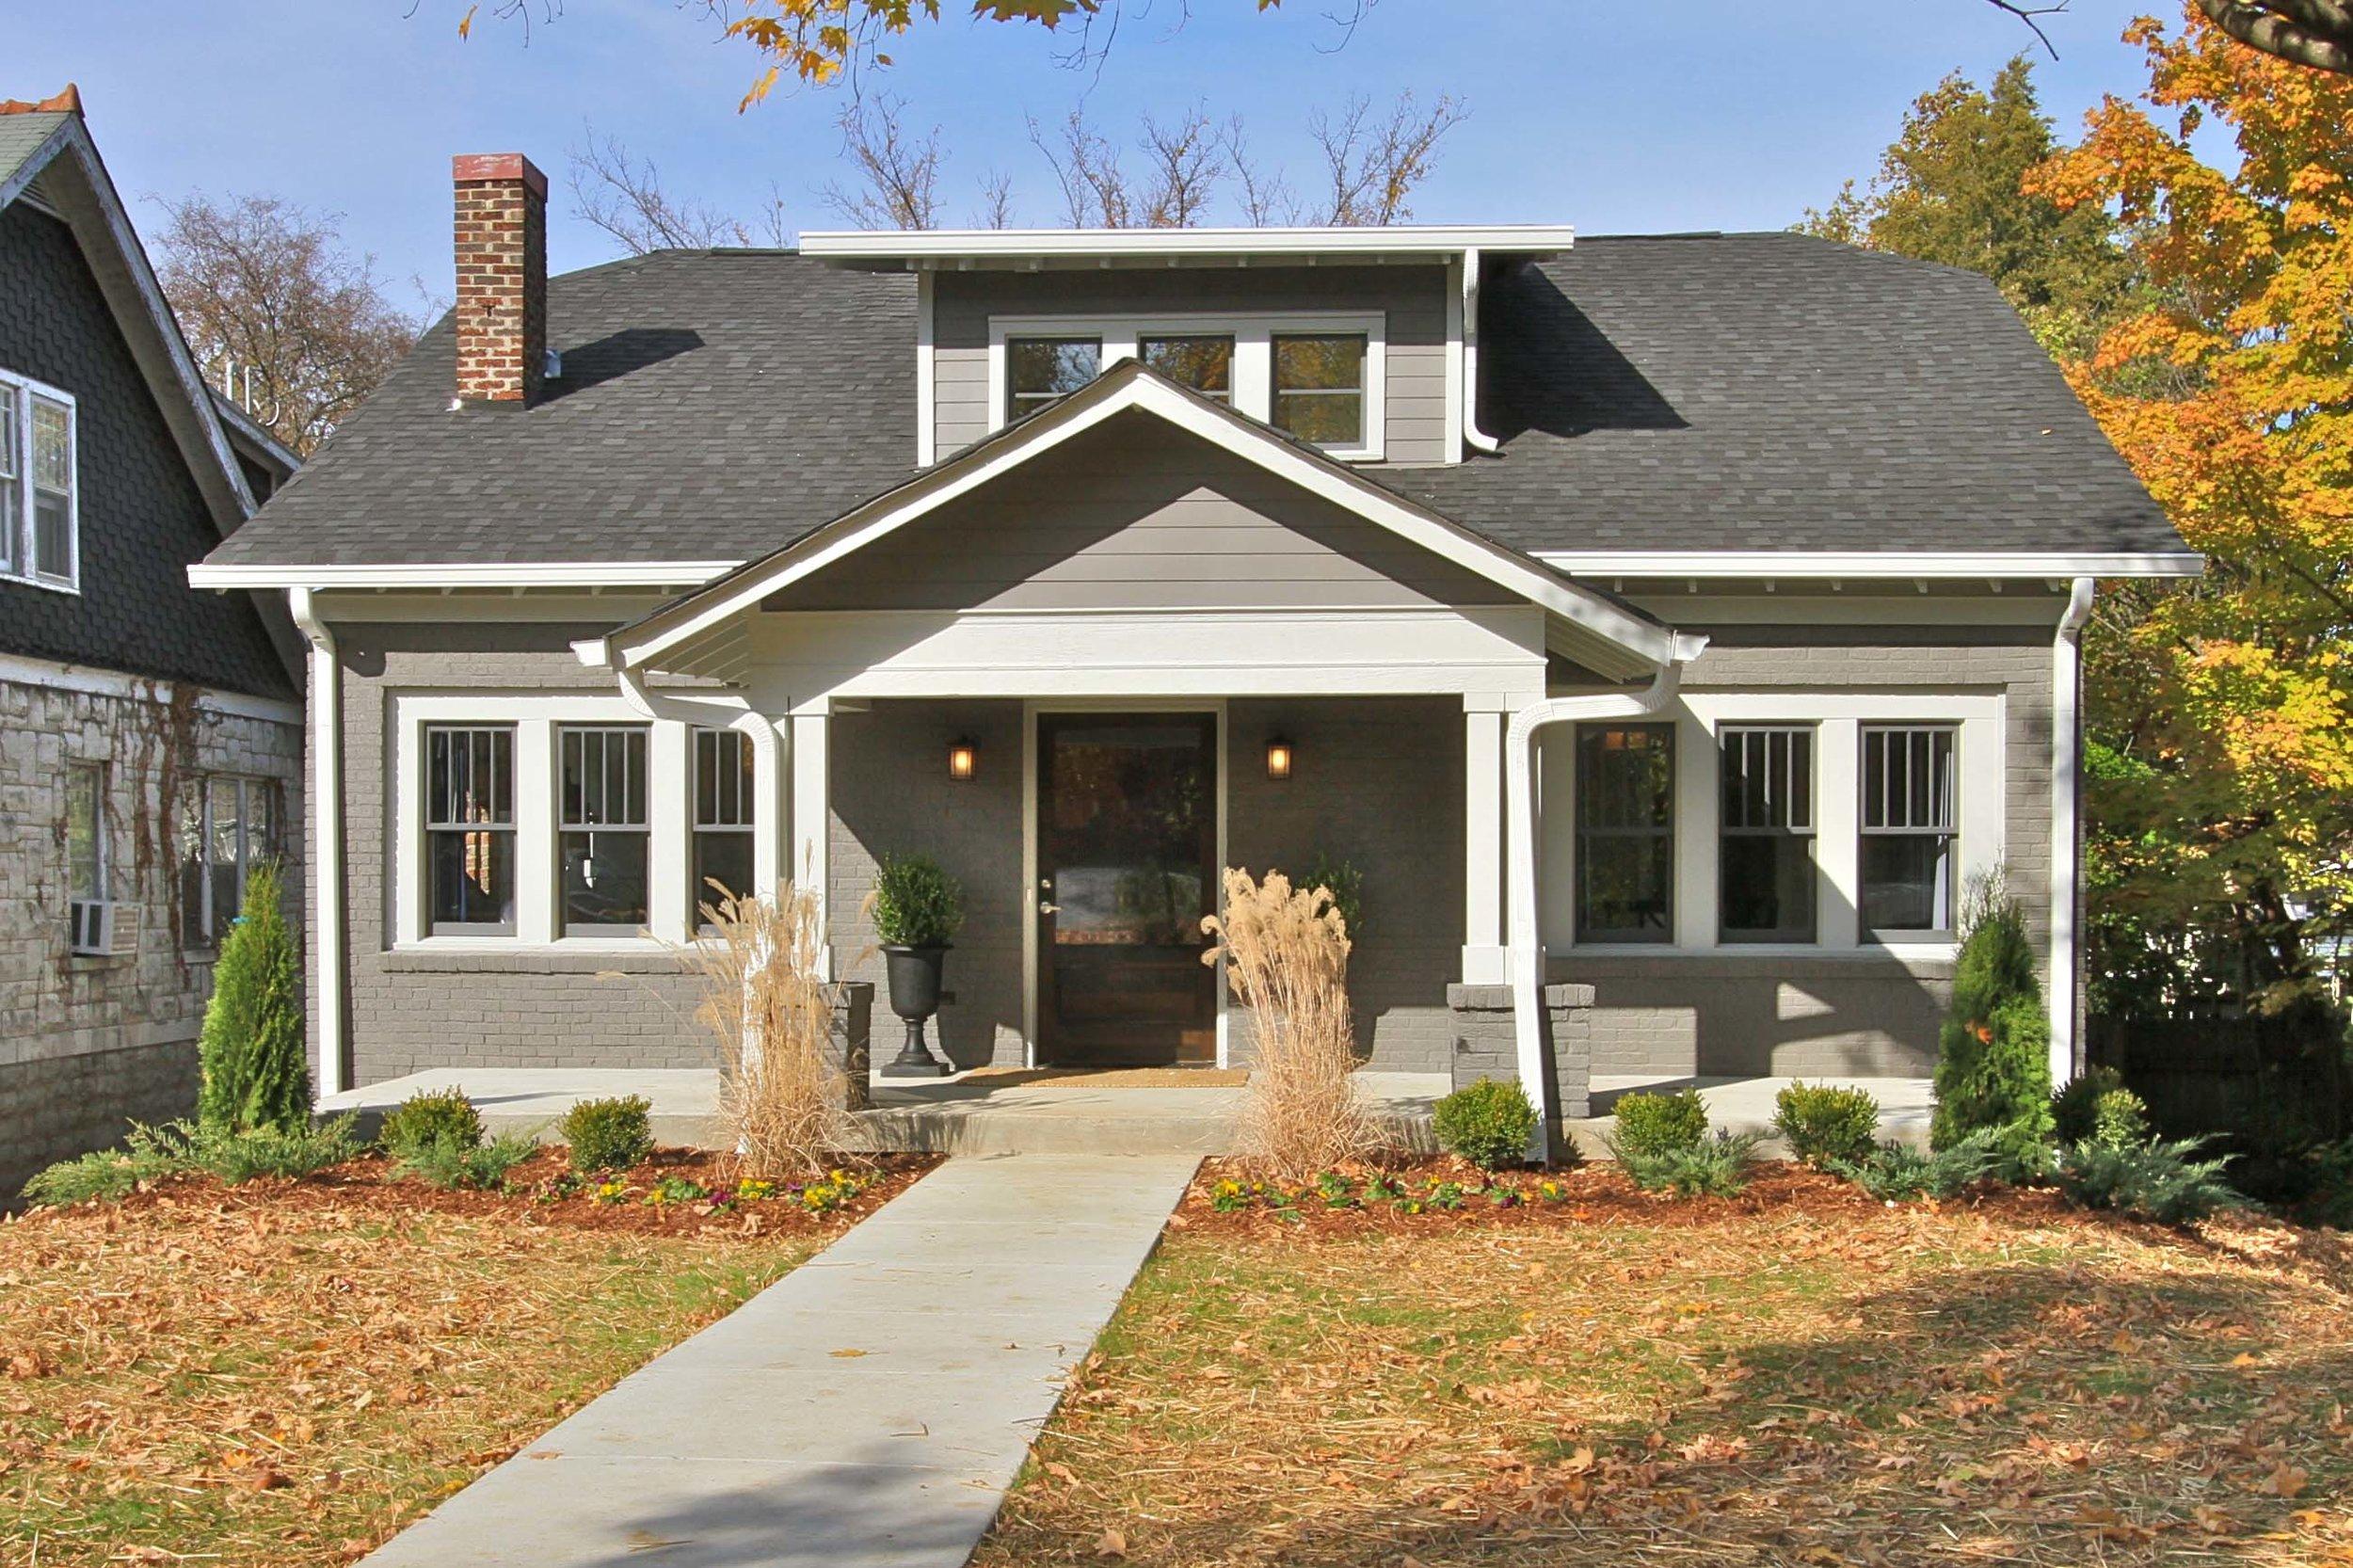 House-Plans-Online-Historic-Nashville-Peggy-Newman-Renovation-House-Murphy.jpg